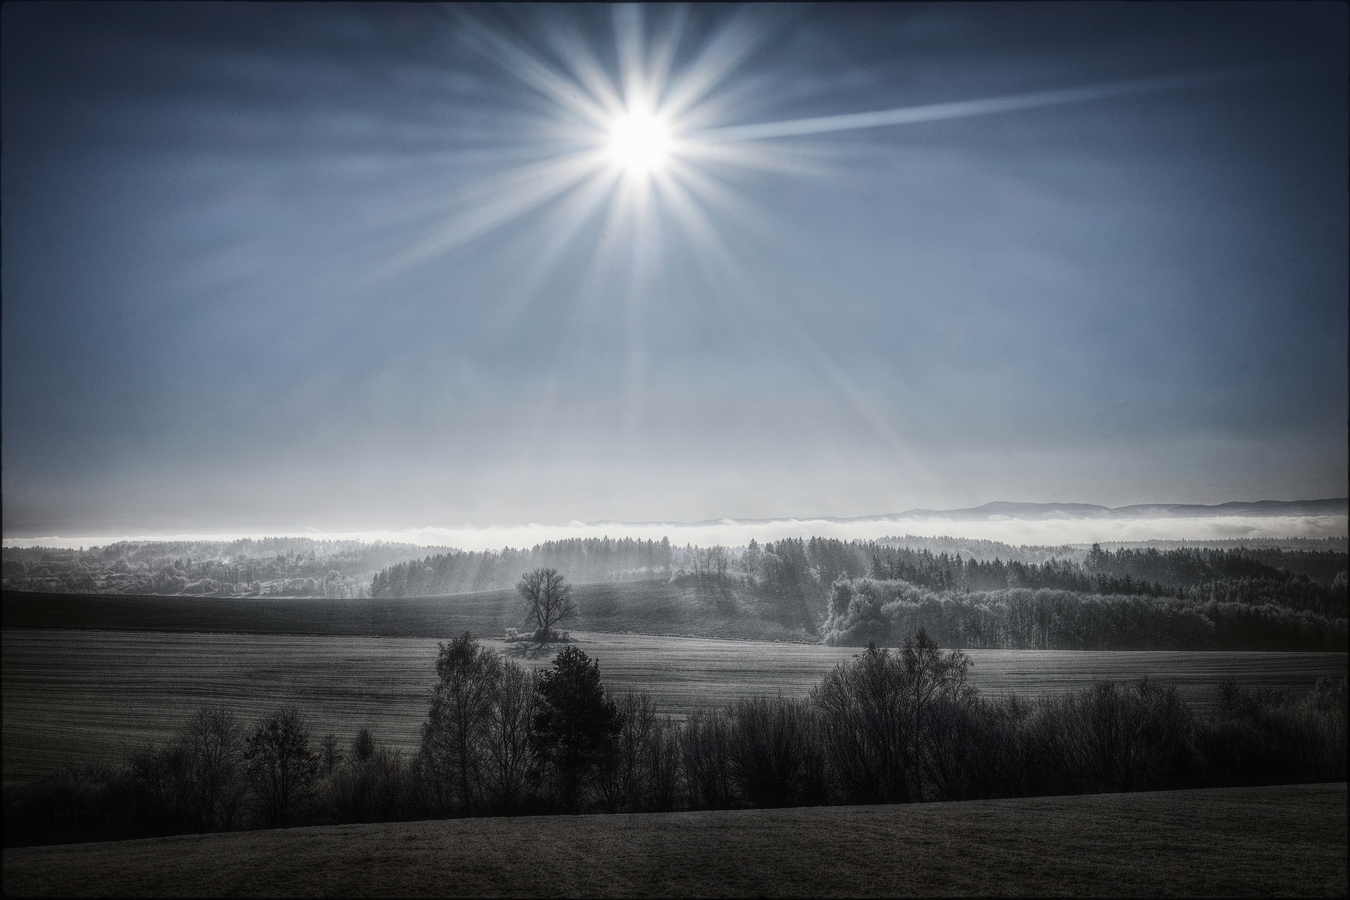 Inverze pod Sluncem